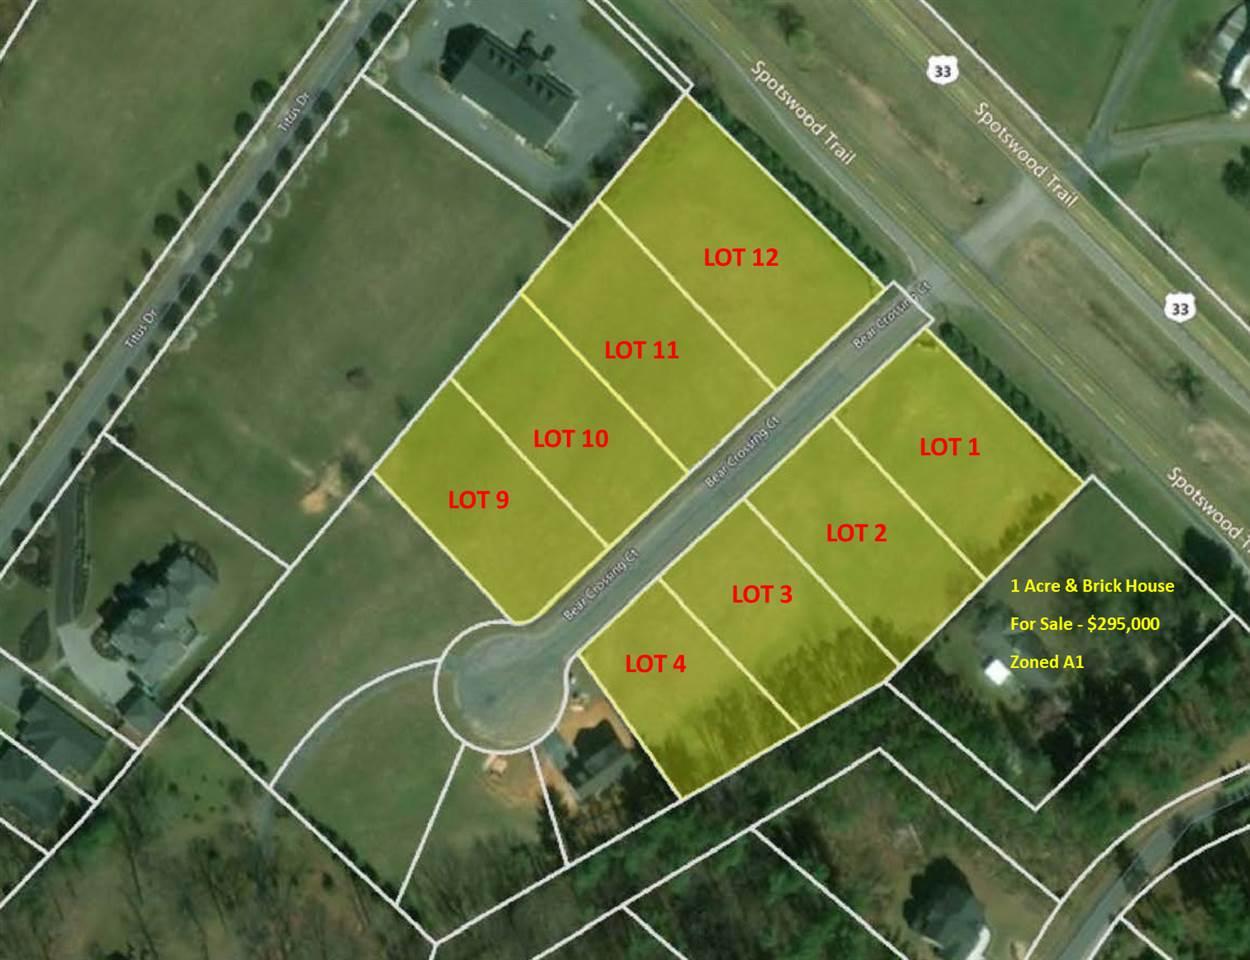 Lot 1 BEAR CROSSING CT, PENN LAIRD, VA 22846